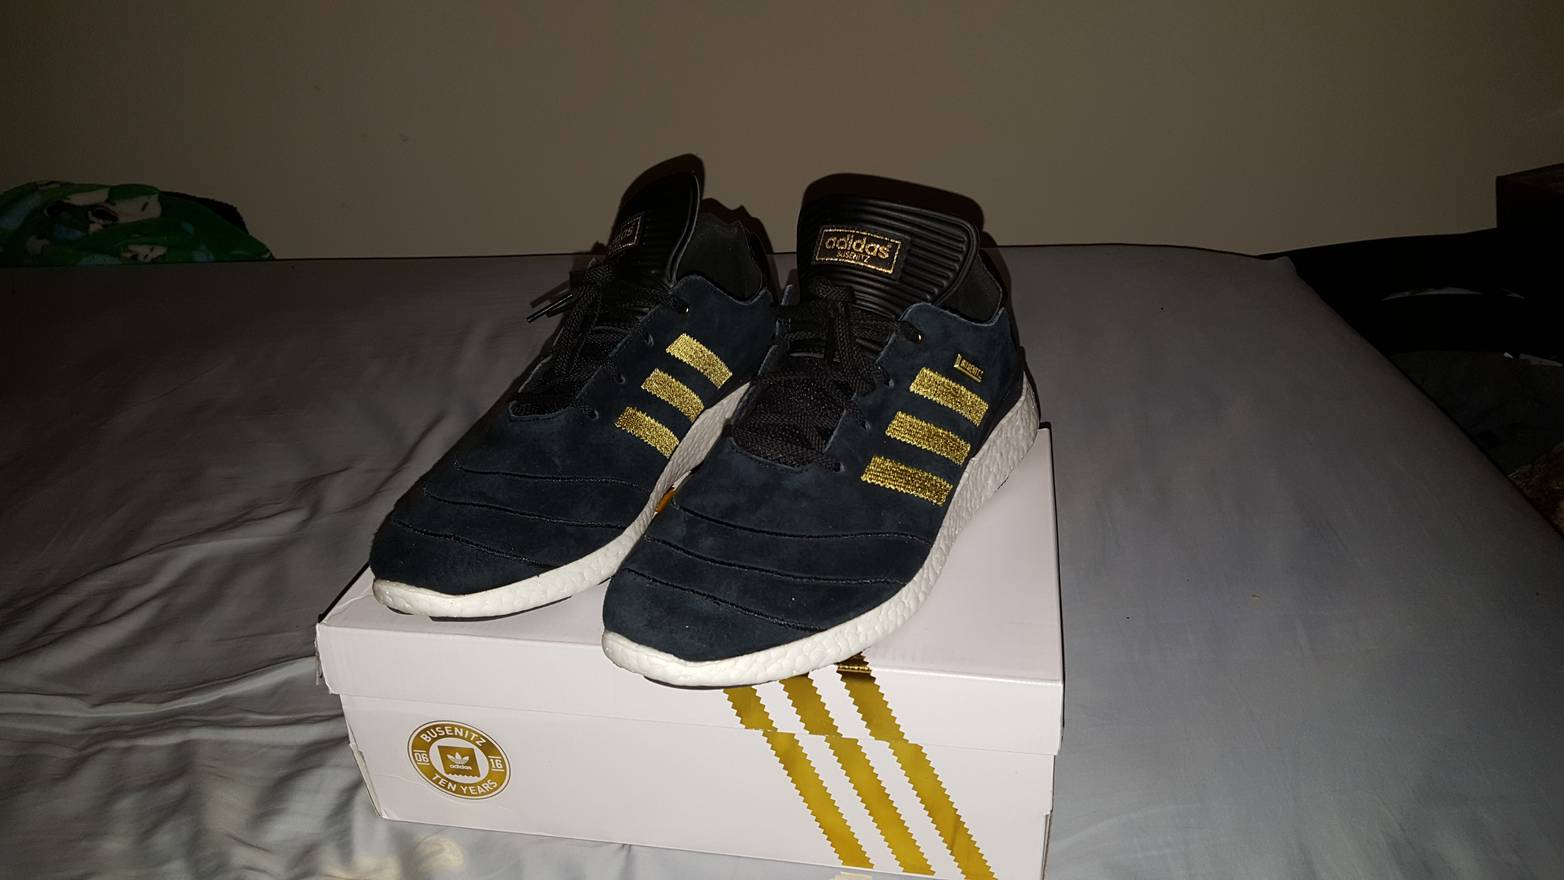 ... Adidas Busenitz Pure Boost 10th Anniversary Size US 11.5 EU 44-45 . b967a1e6e